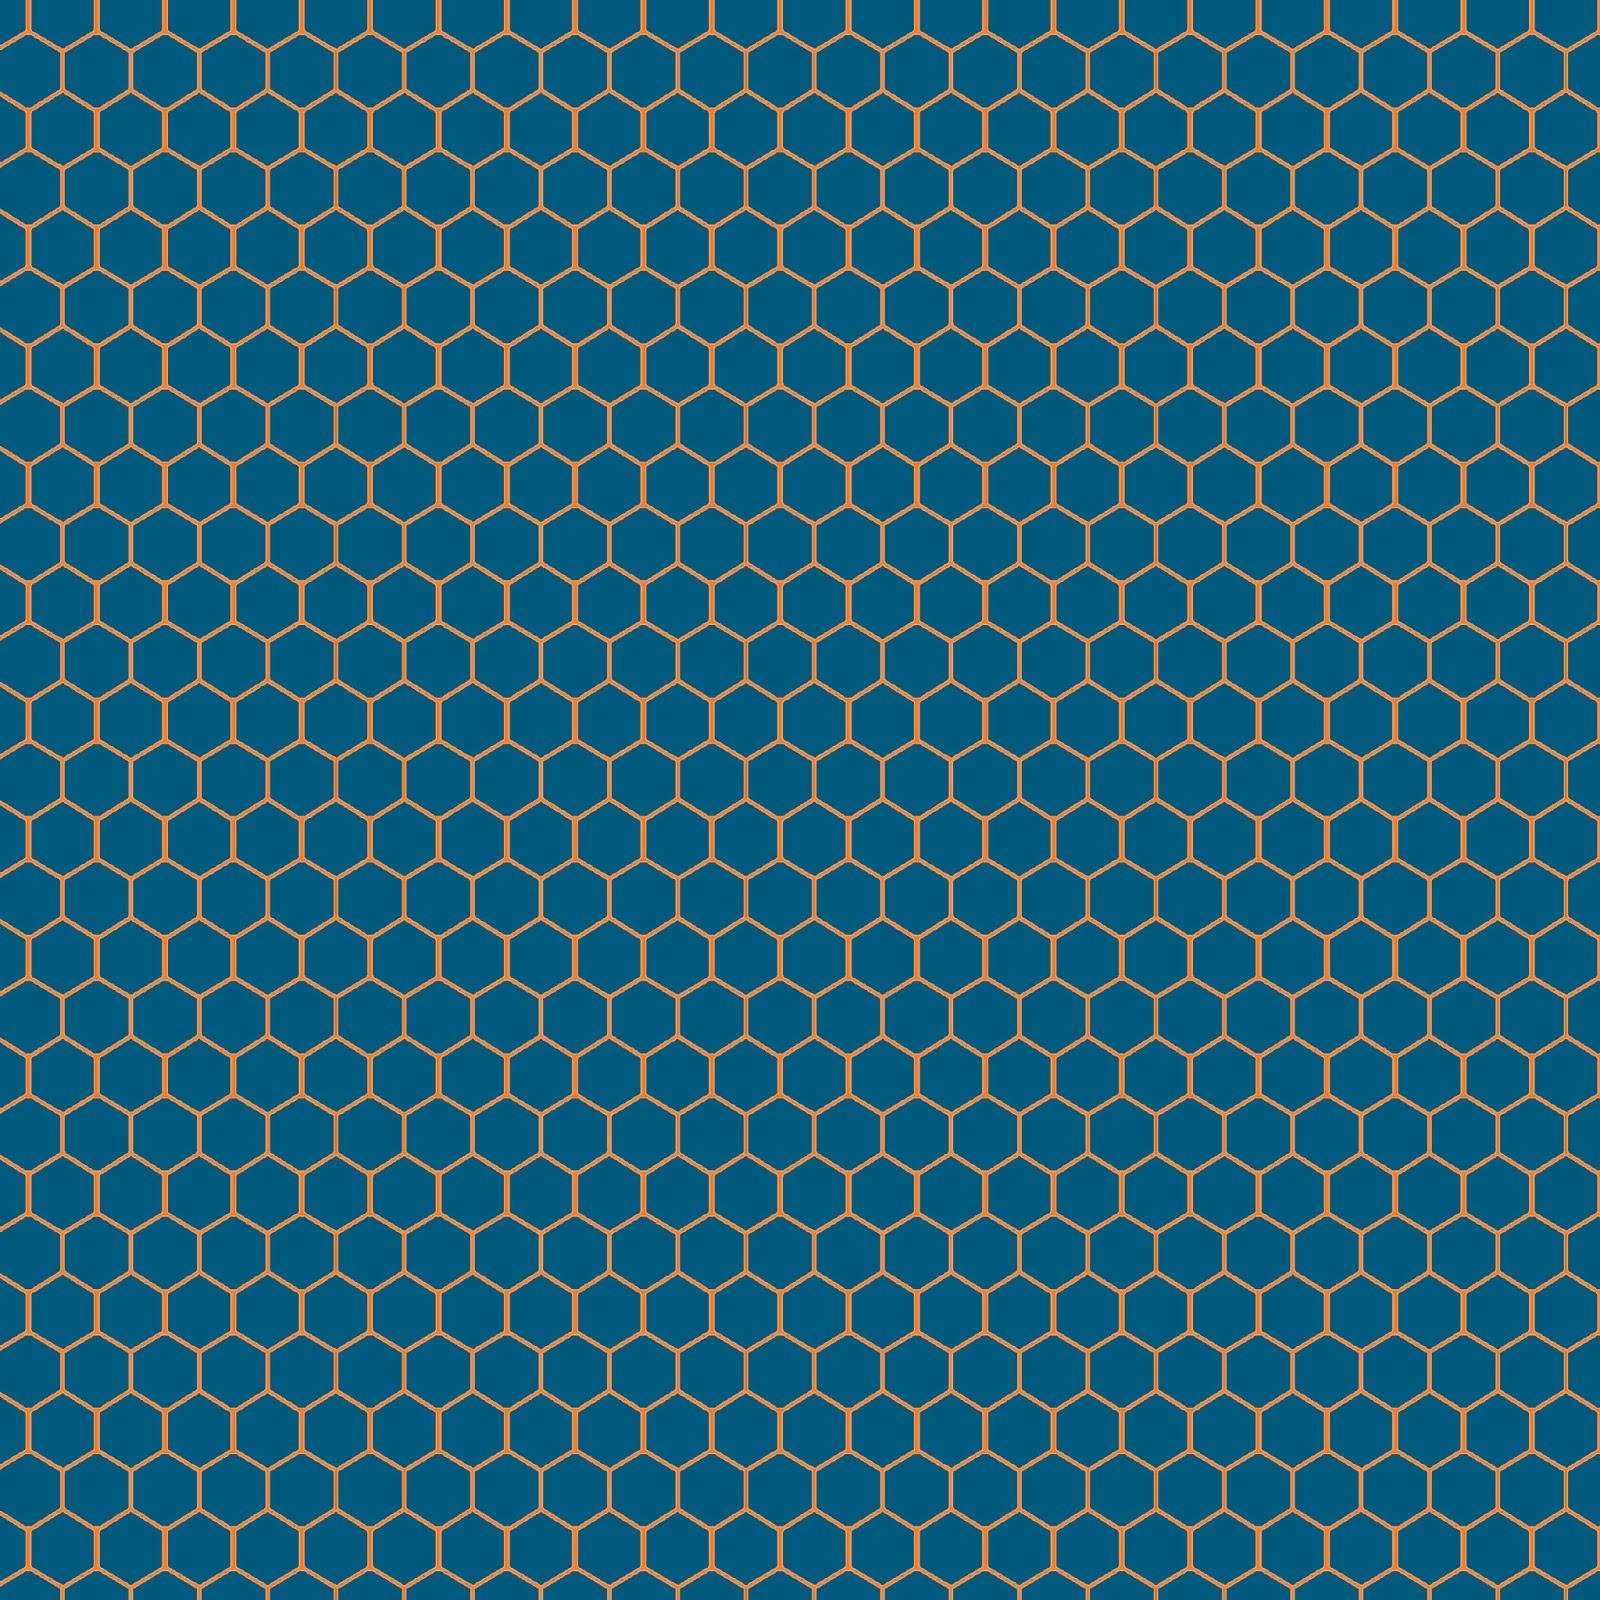 Blue honeycomb pattern wallpaper Wallpaper Wide HD 1600x1600